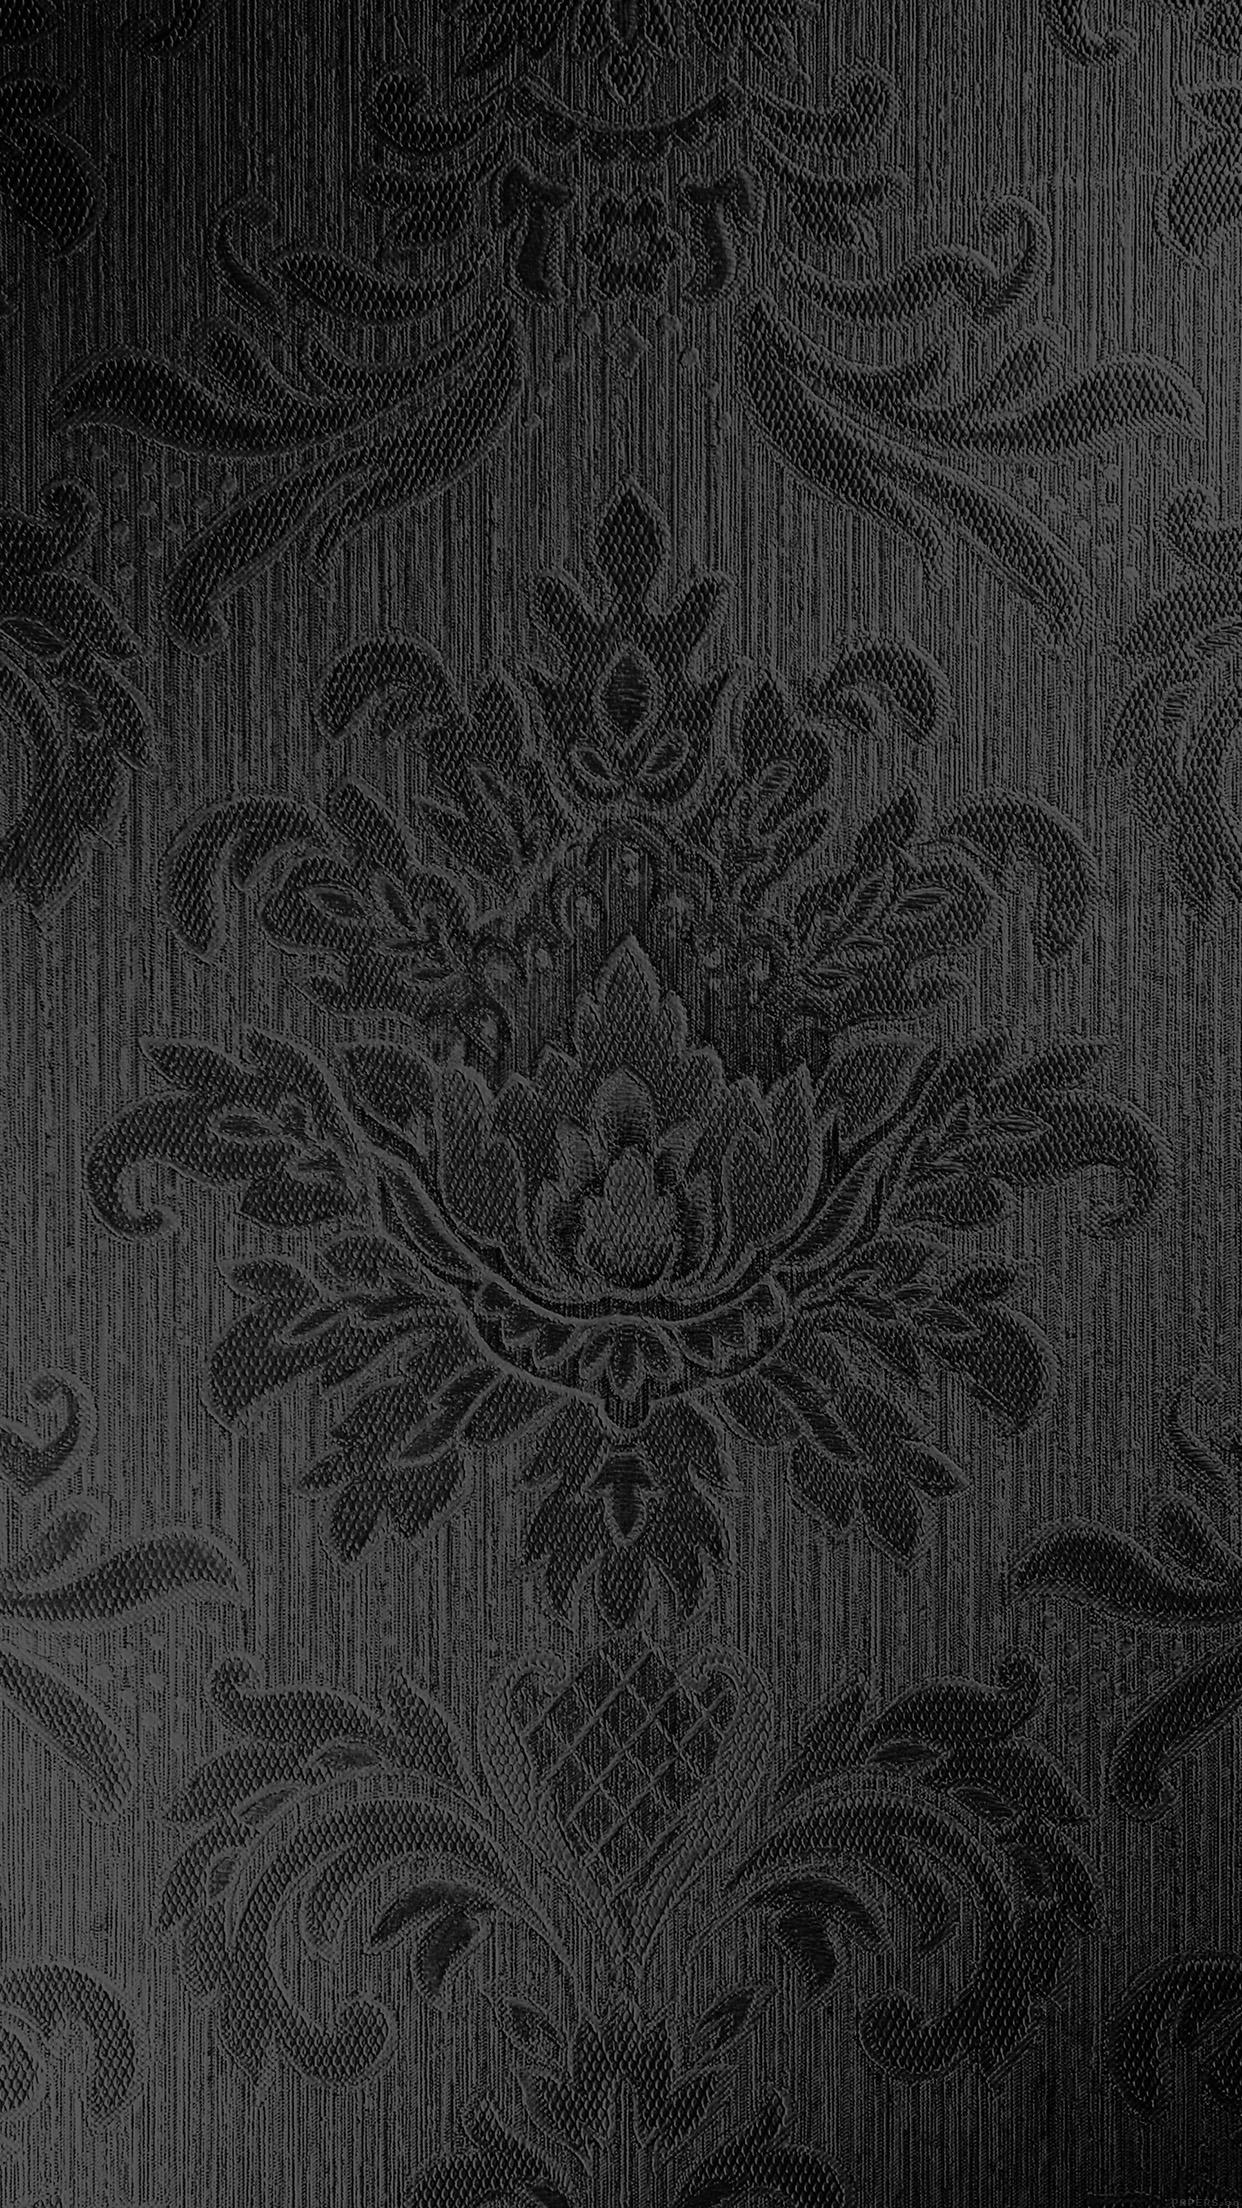 Iphone7papers Vf68 Vintage Art Bw Dark Texture Pattern